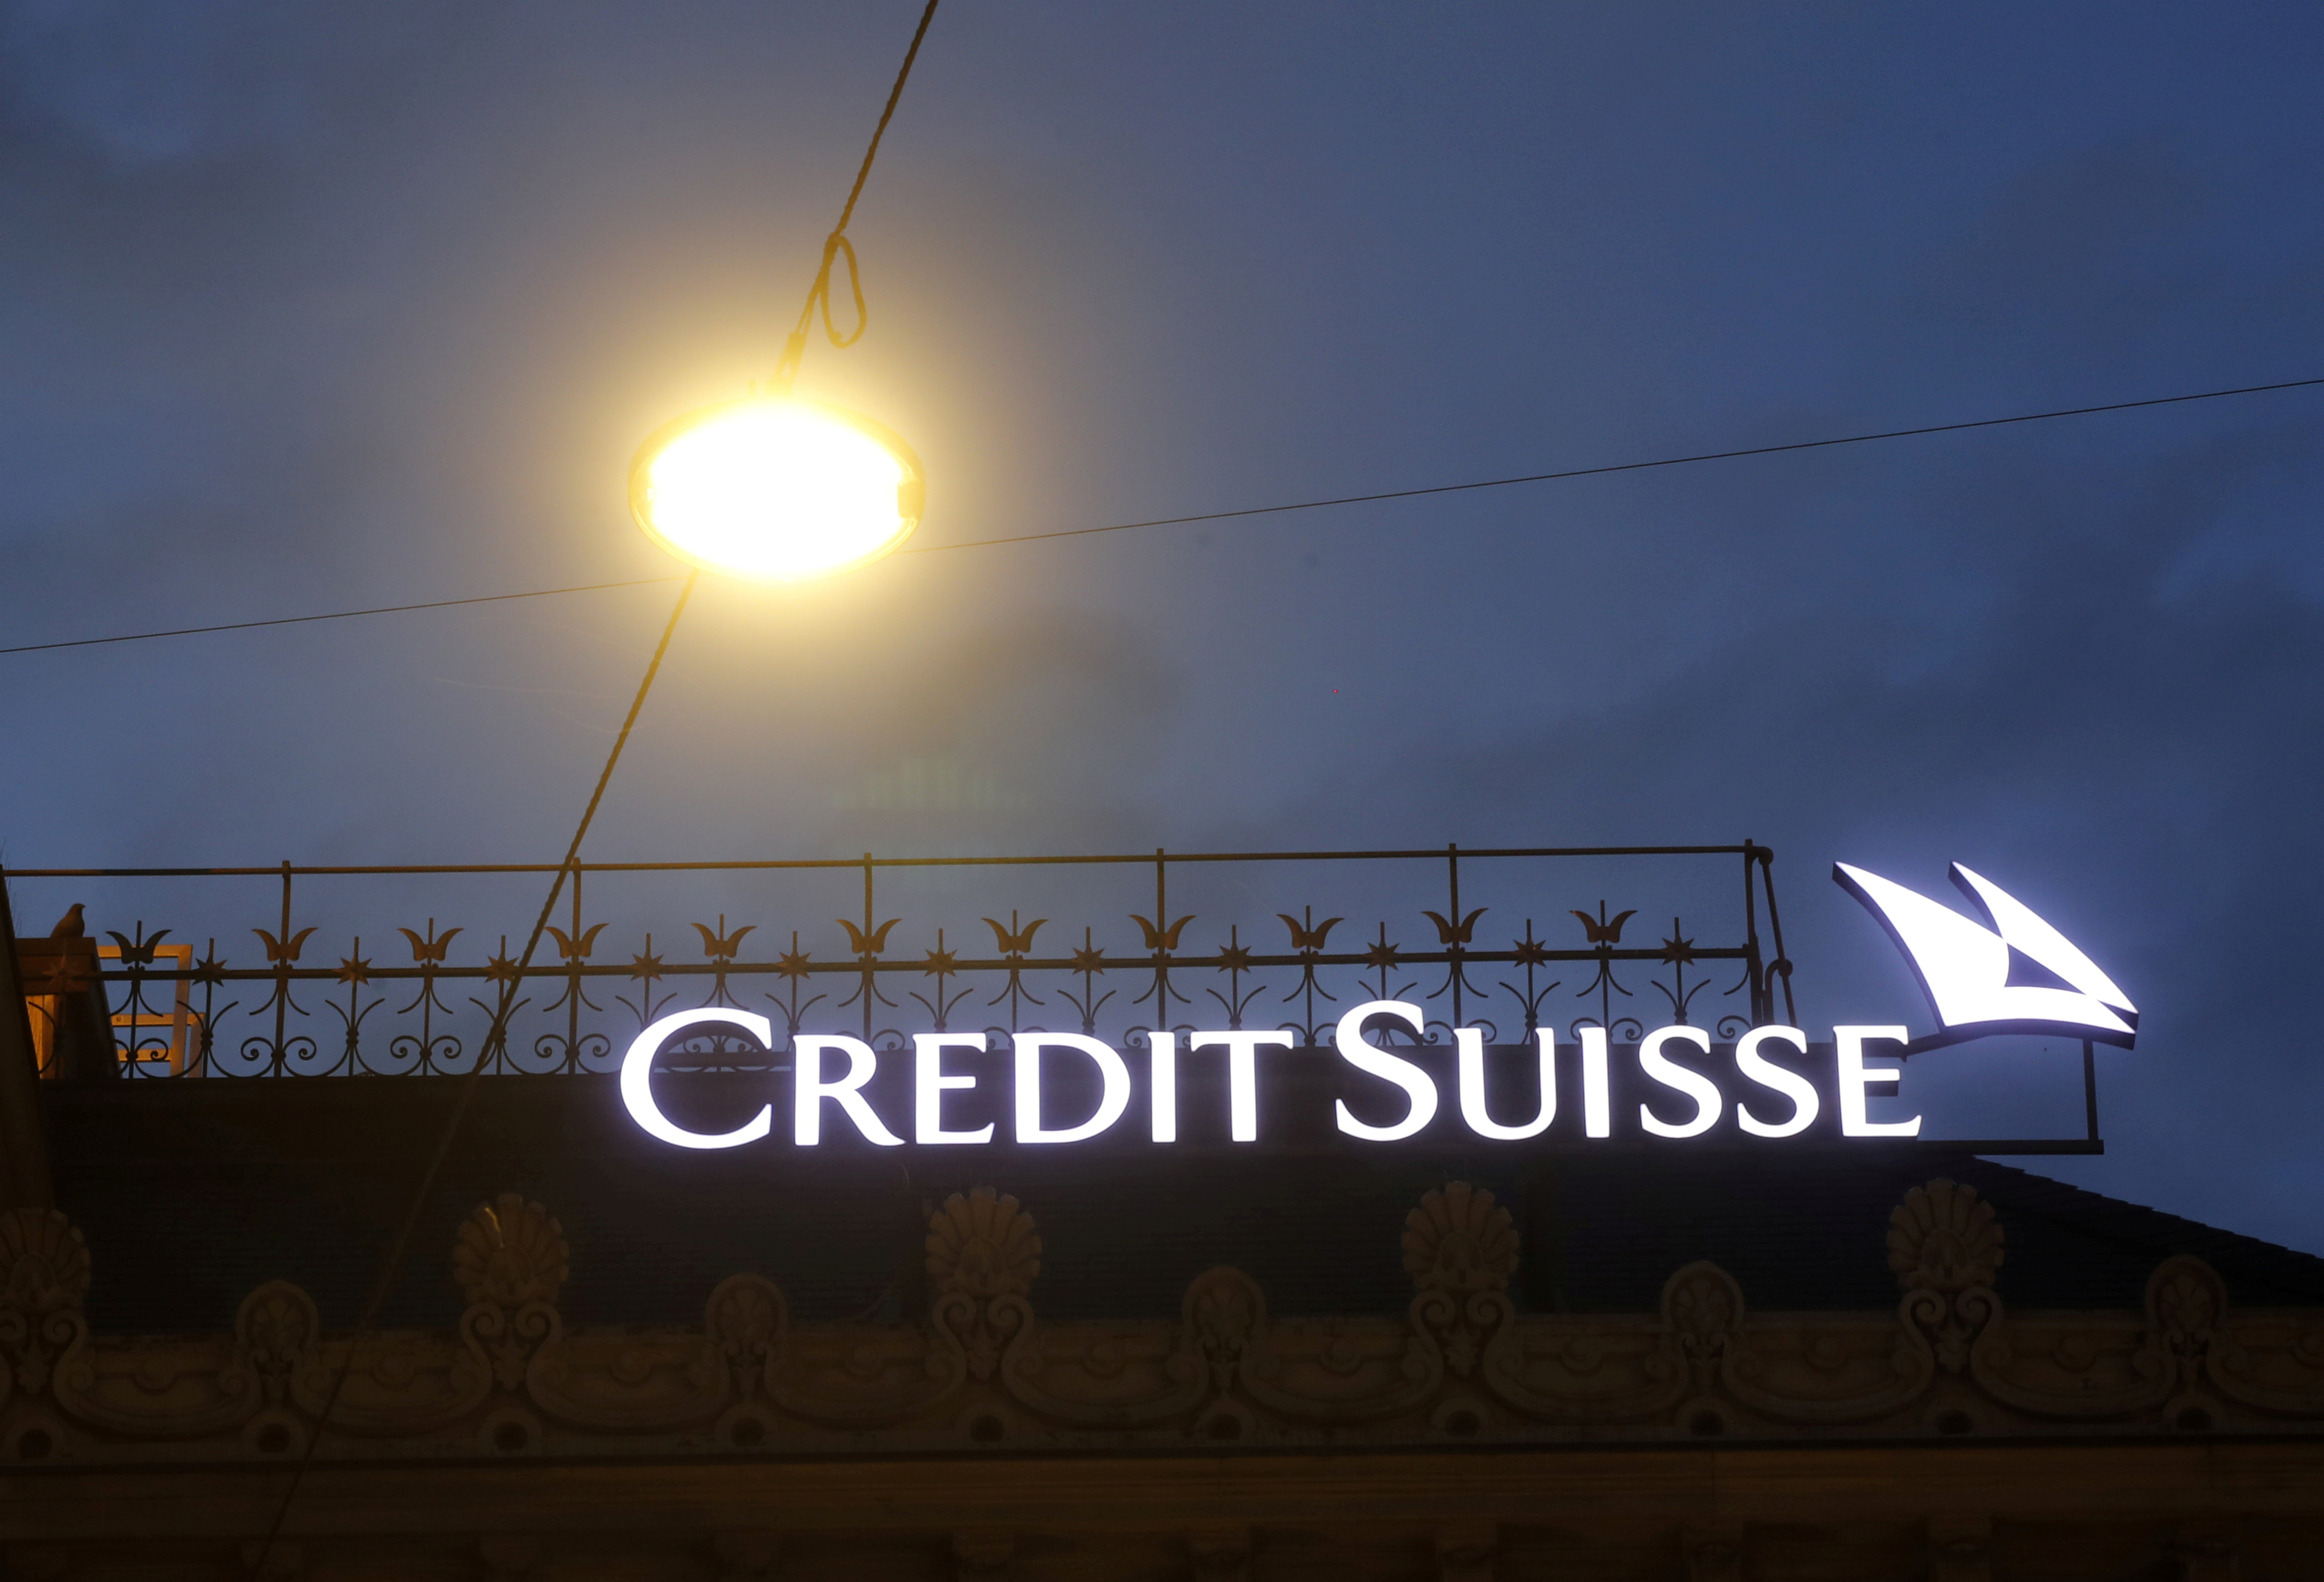 The logo of Swiss bank Credit Suisse is seen at its headquarters in Zurich, Switzerland June 22, 2020. REUTERS/Arnd Wiegmann/File Photo